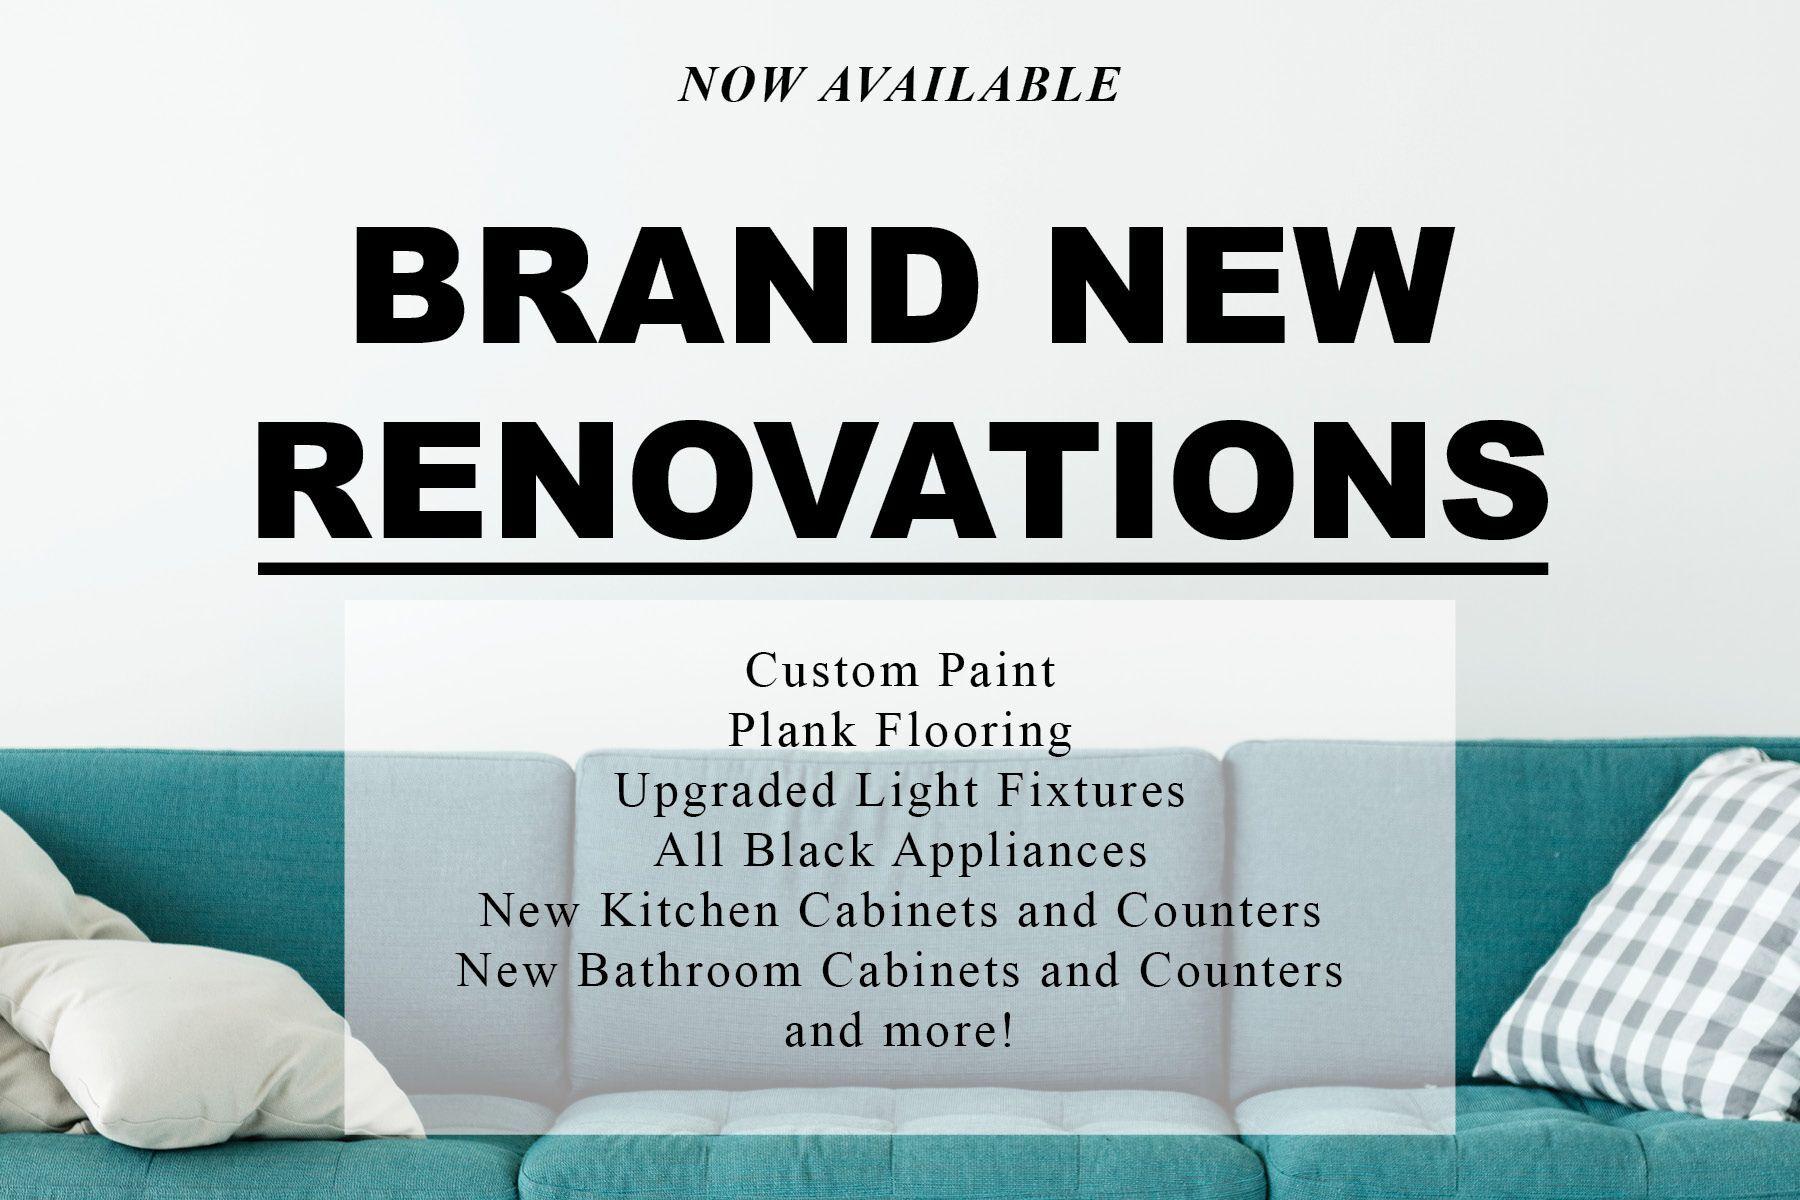 Brand New Renovations